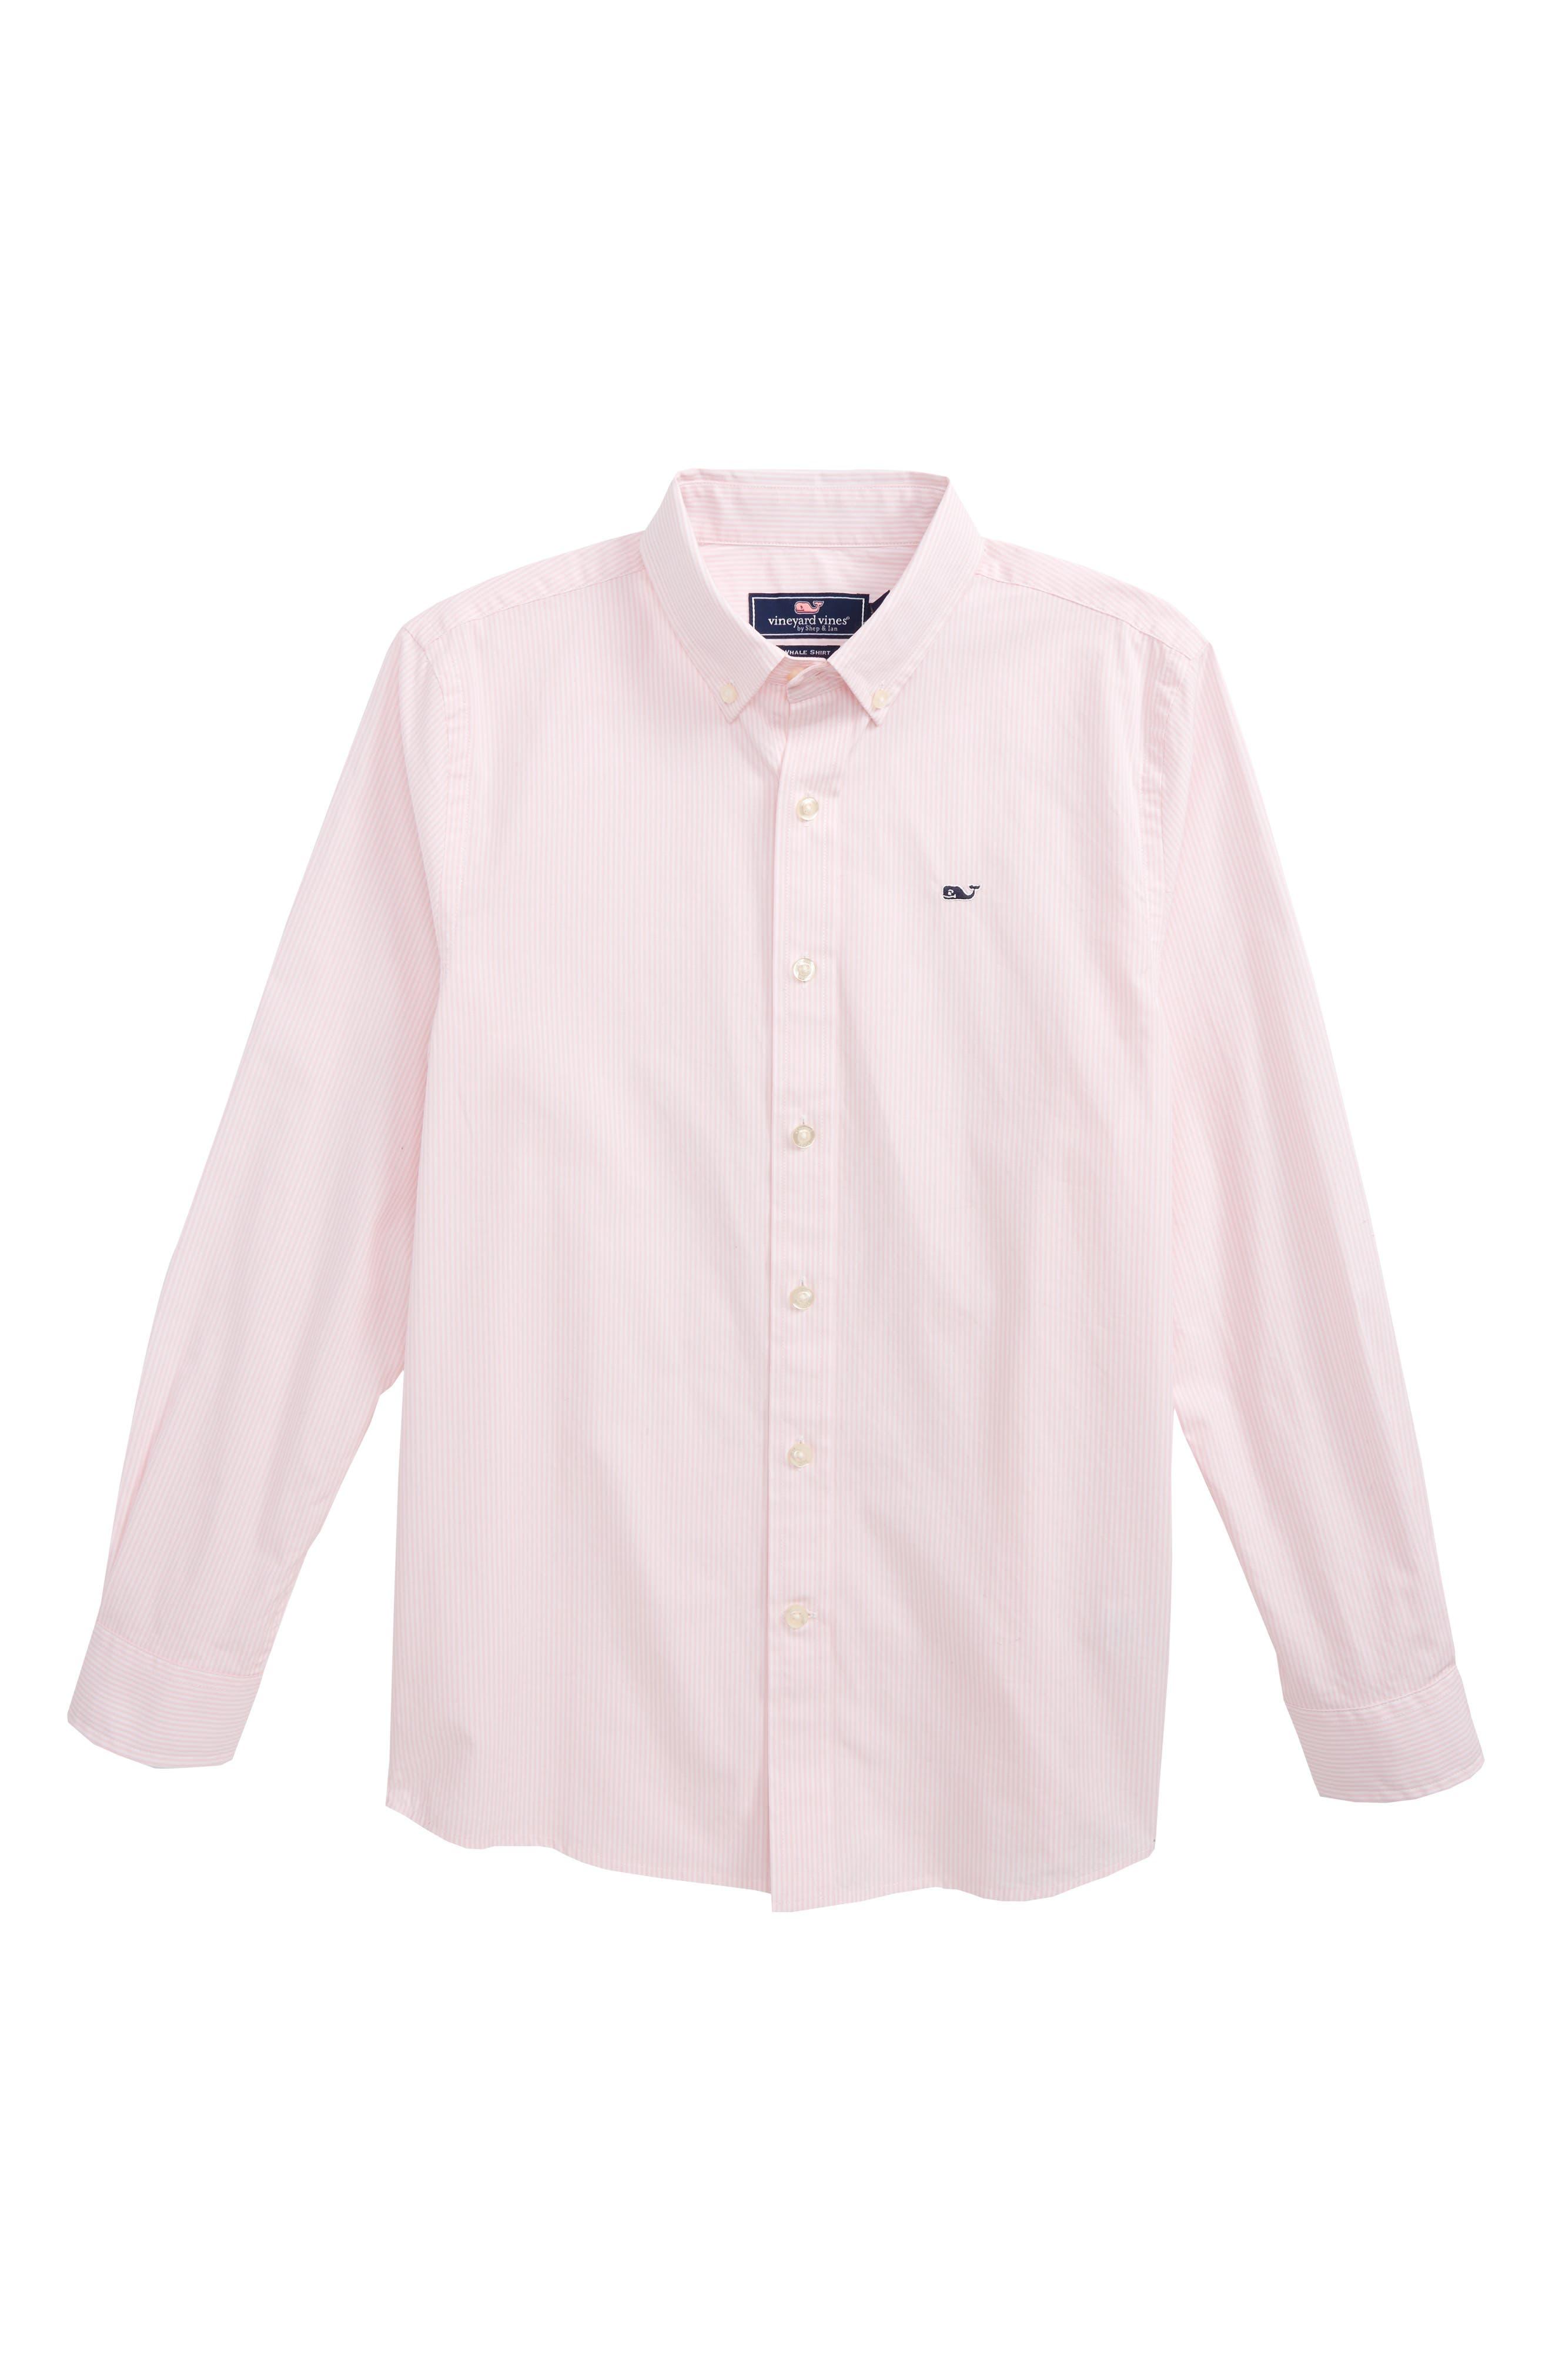 Fine Line Stripe - Whale Woven Shirt,                         Main,                         color, Flamingo